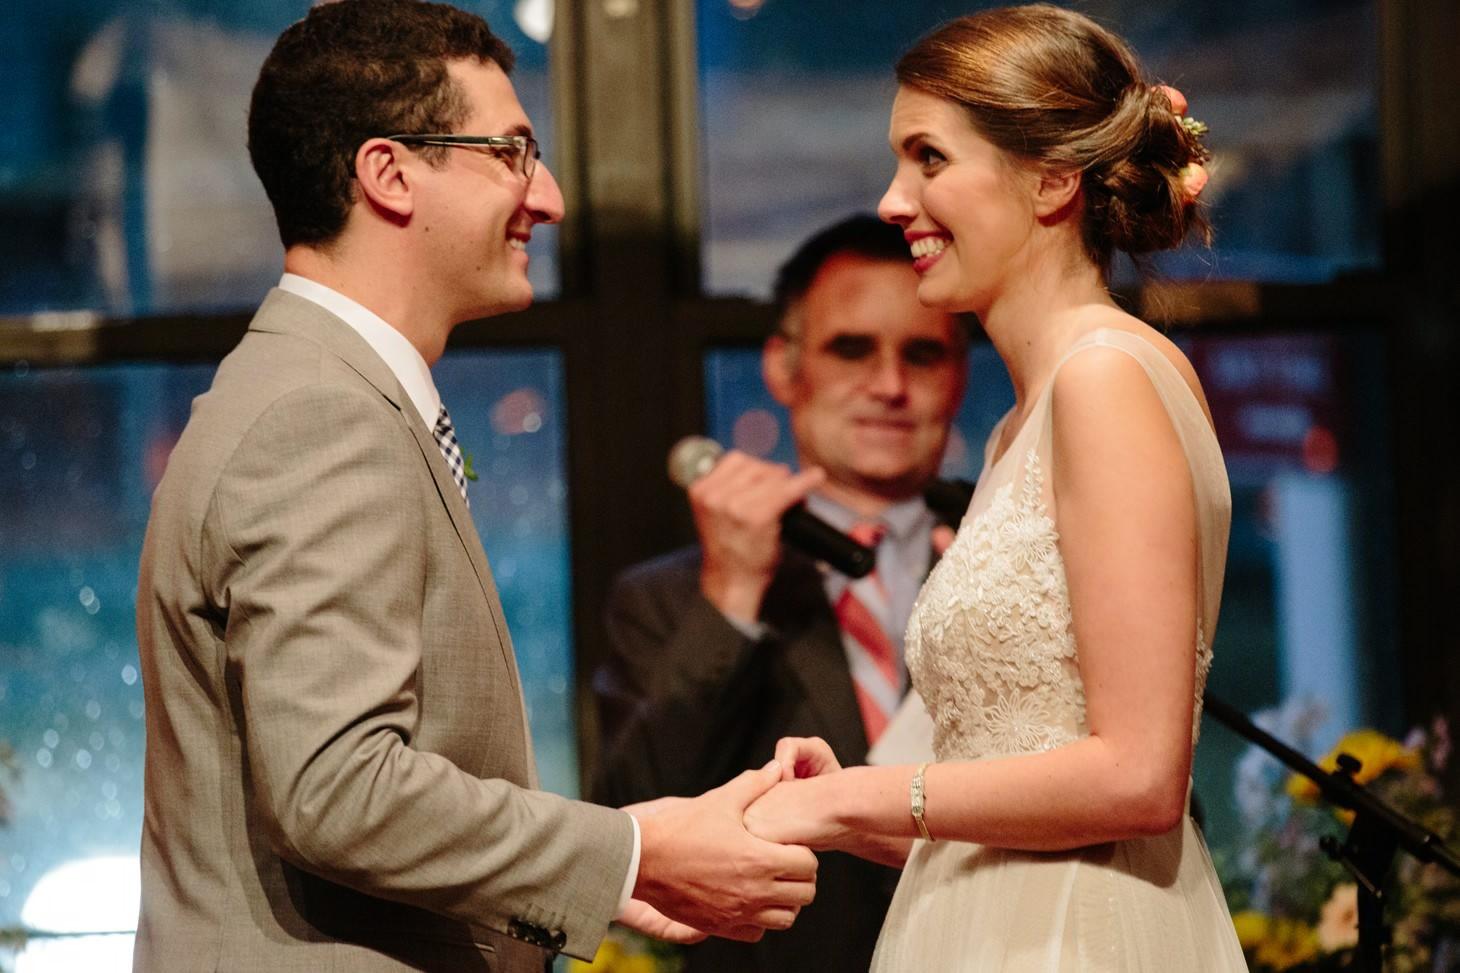 029-nyc-dumbo-loft-brooklyn-wedding-photographer-smitten-chickens-photo-.jpg